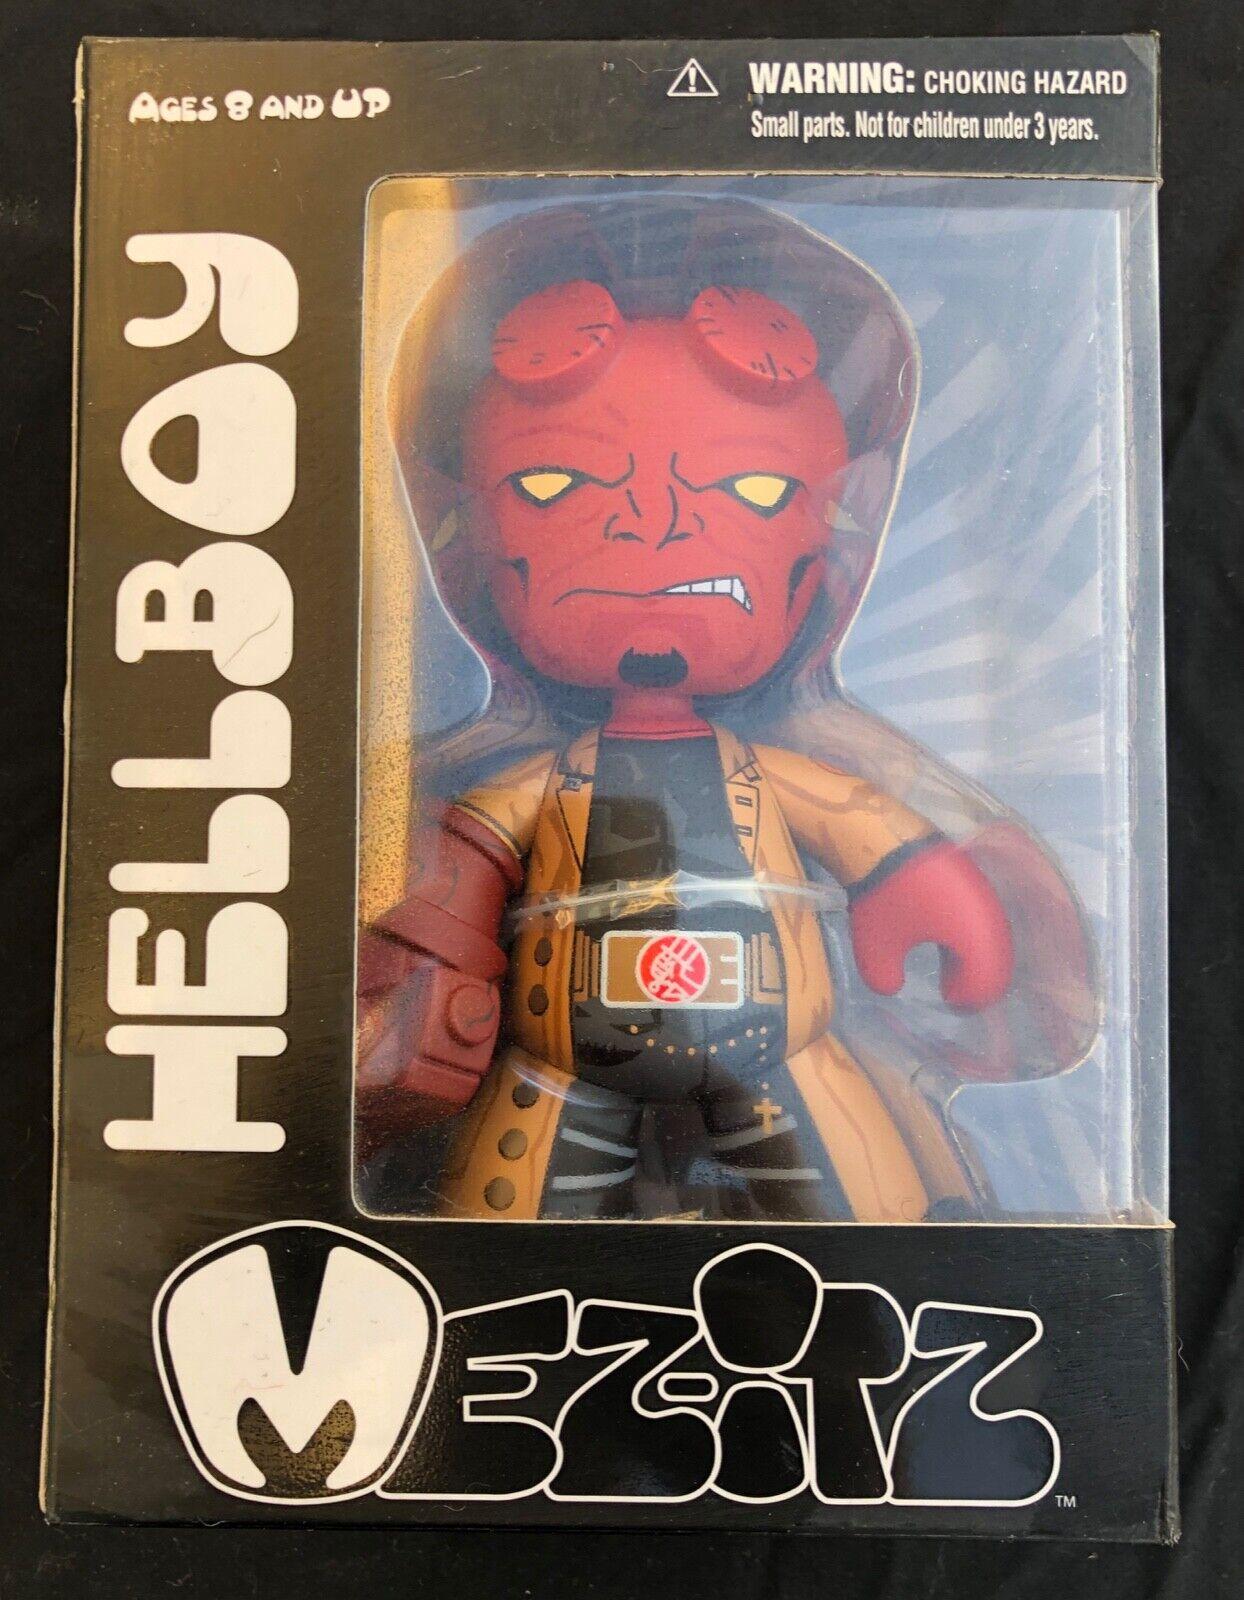 Mezco Toyz Mez-Itz Hellboy Exclusive Vinyl Figure Figure Figure 85491a